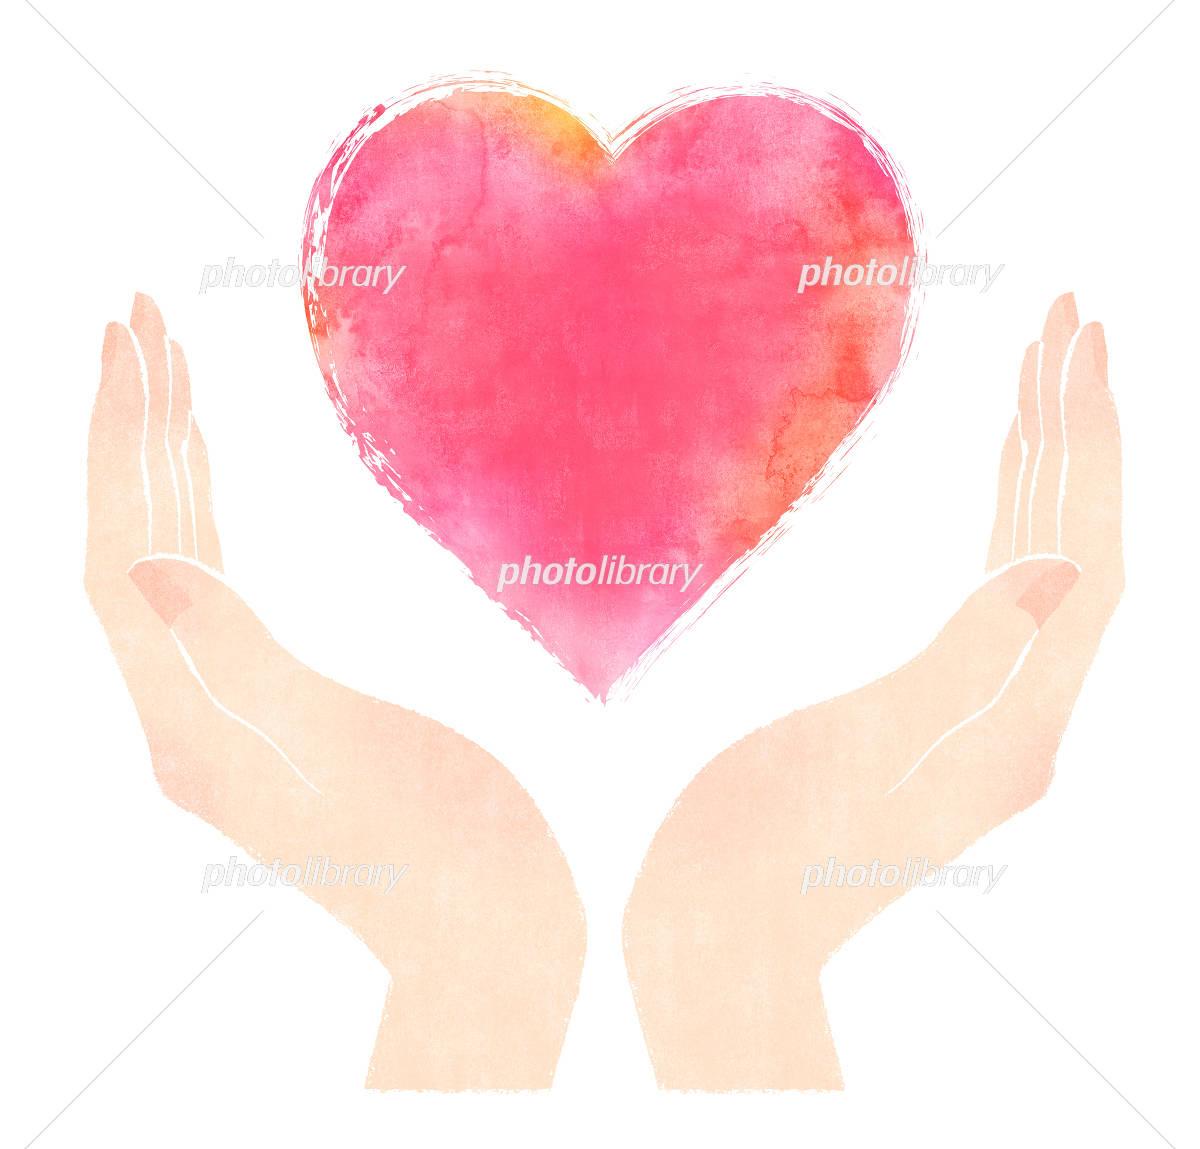 Heart palm 4 イラスト素材